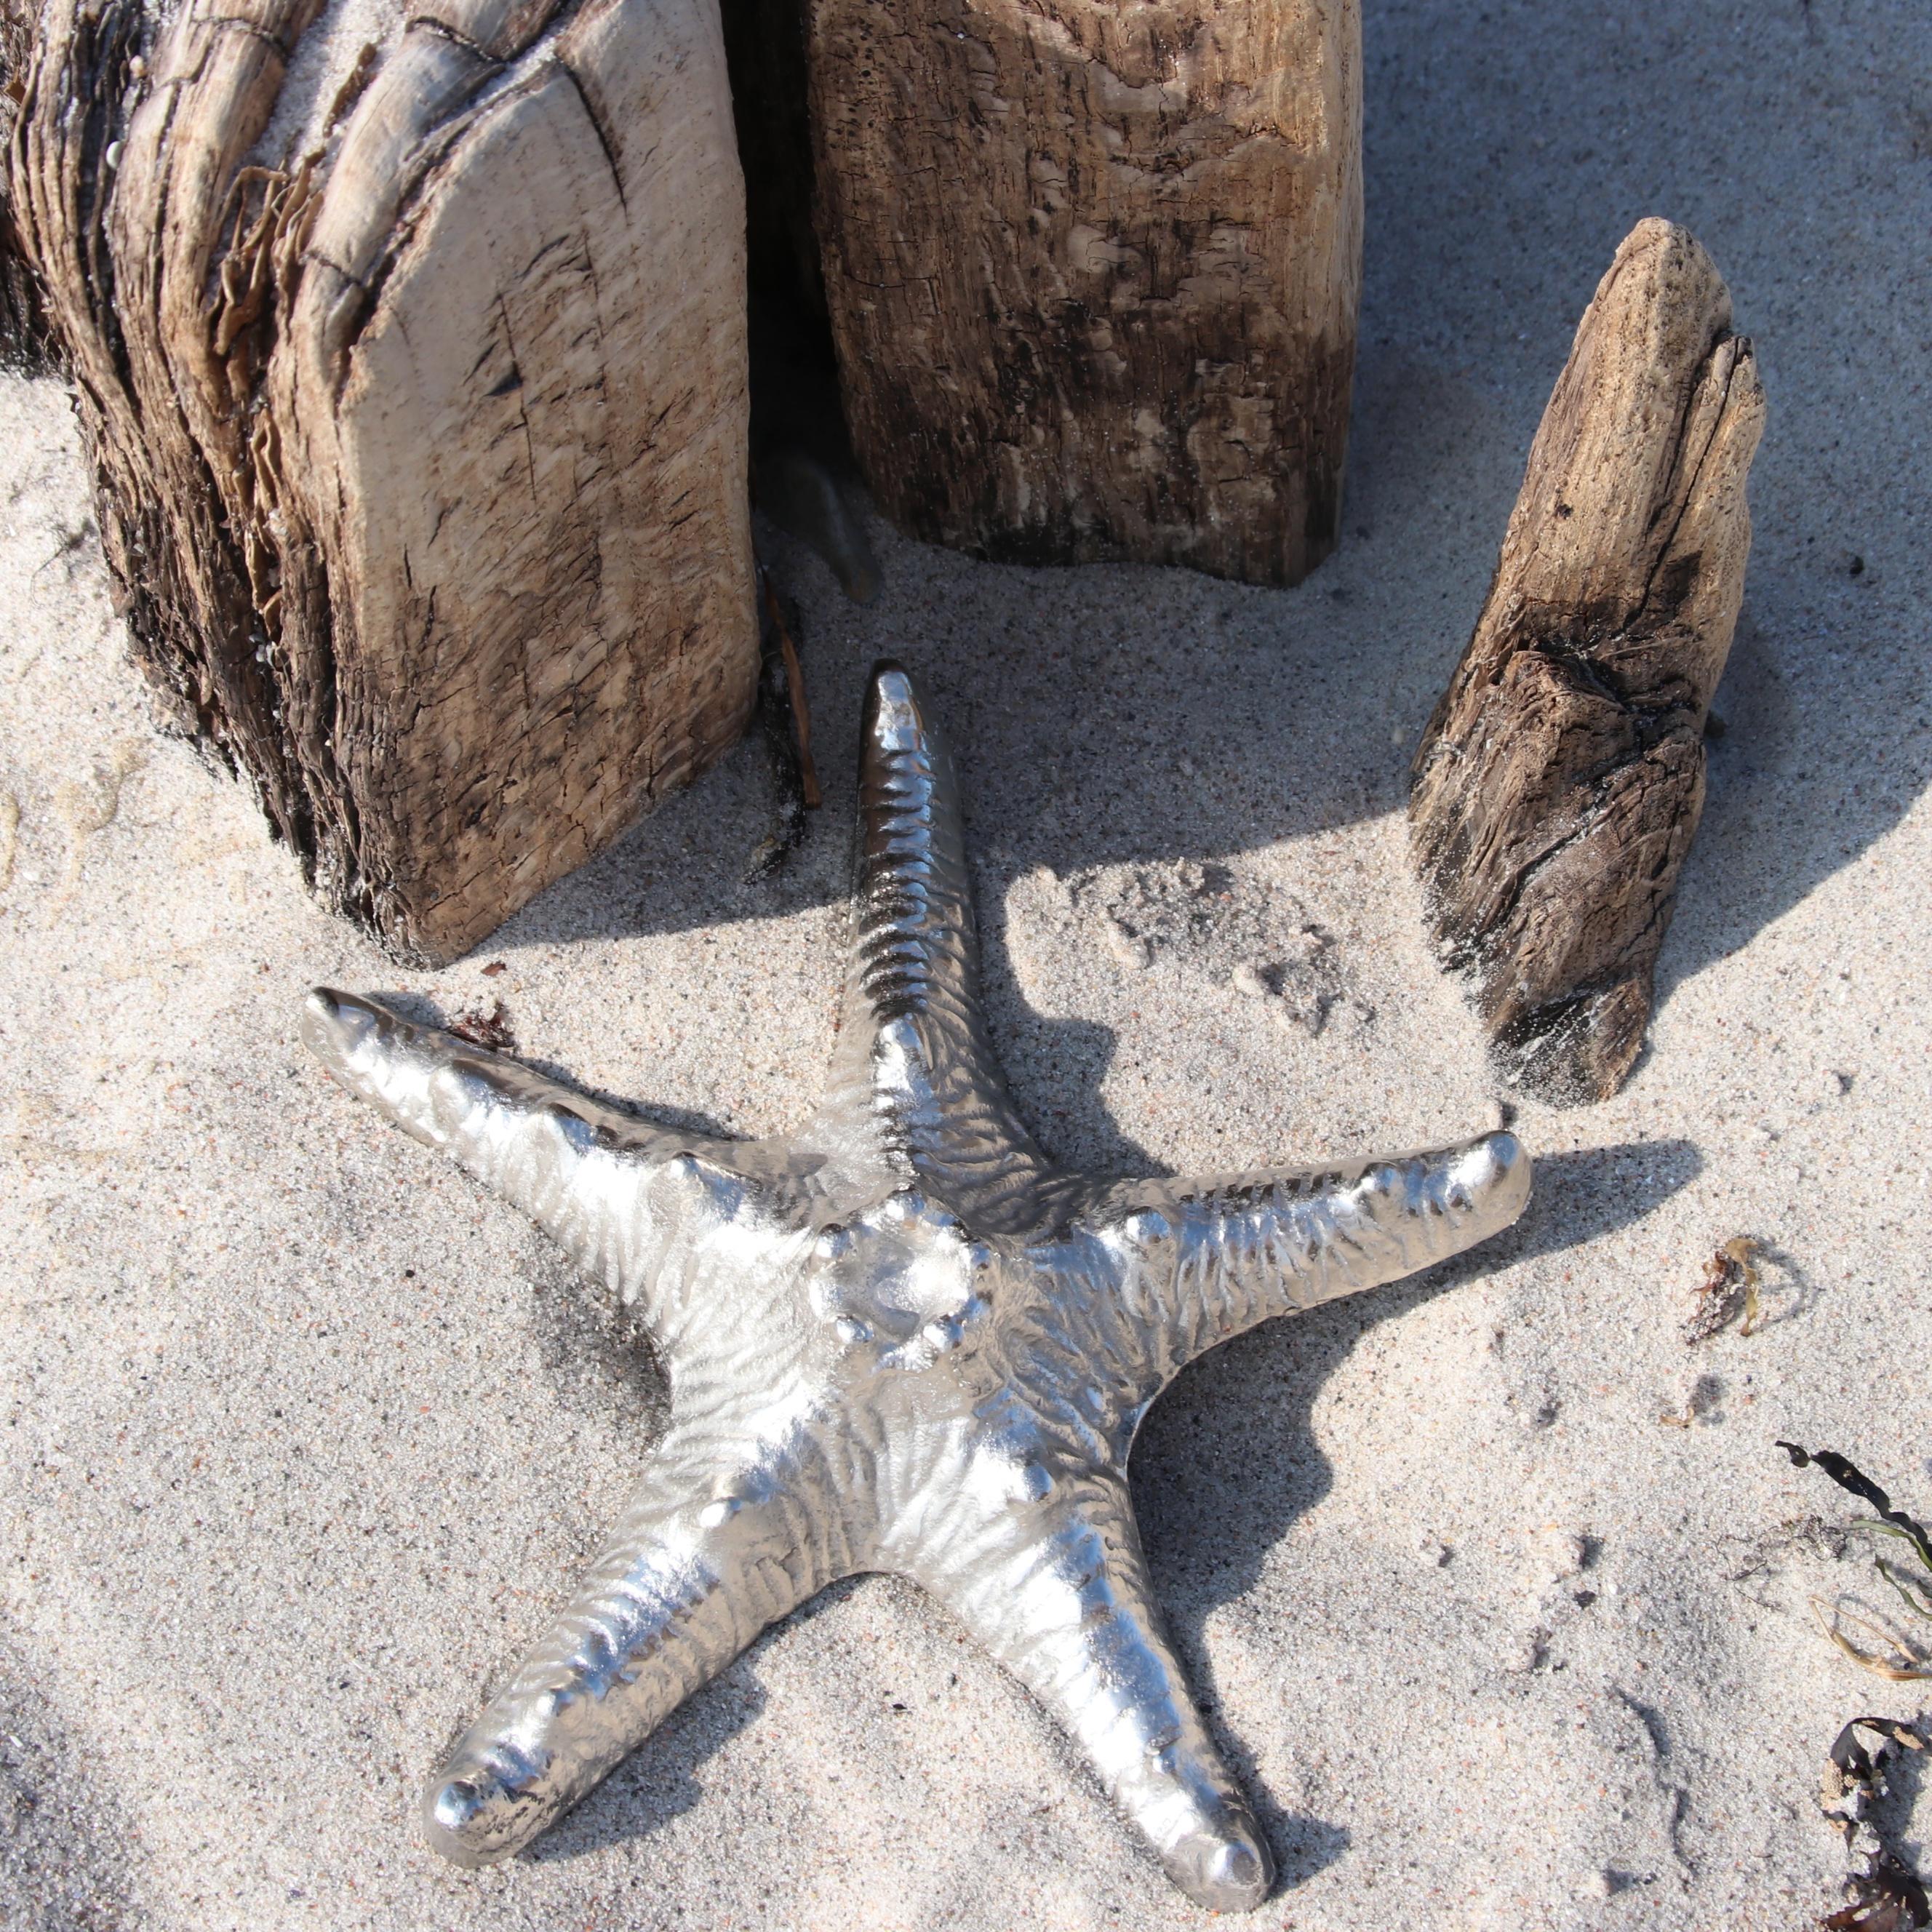 Meerestiere silber aluminium 2 varianten deko wohnen for Deko accessoires wohnen